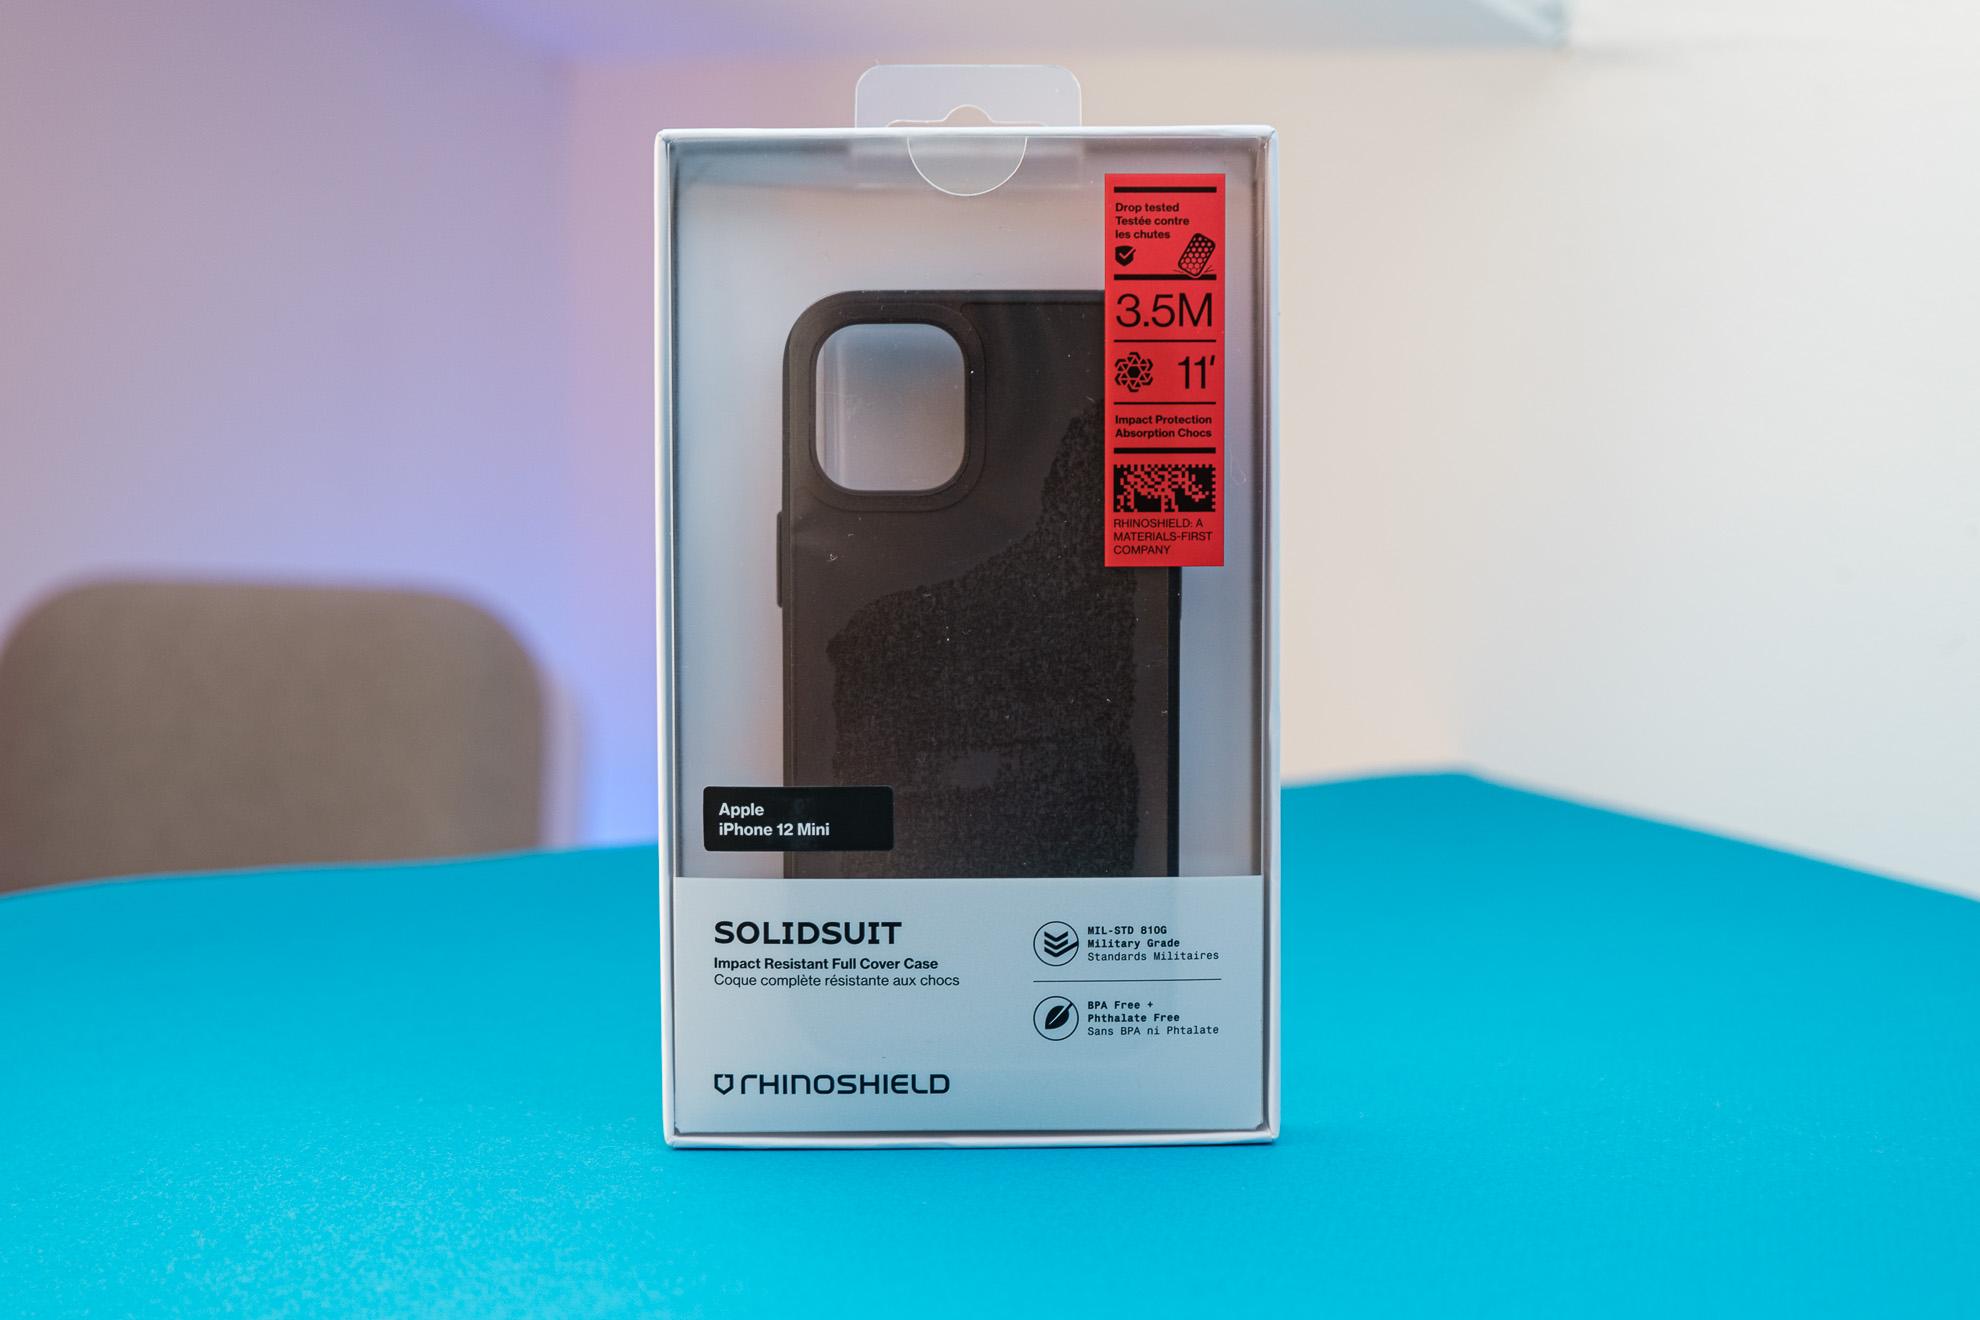 Rhinoshield Solidsuit pour iPhone 12 mini: mon avis